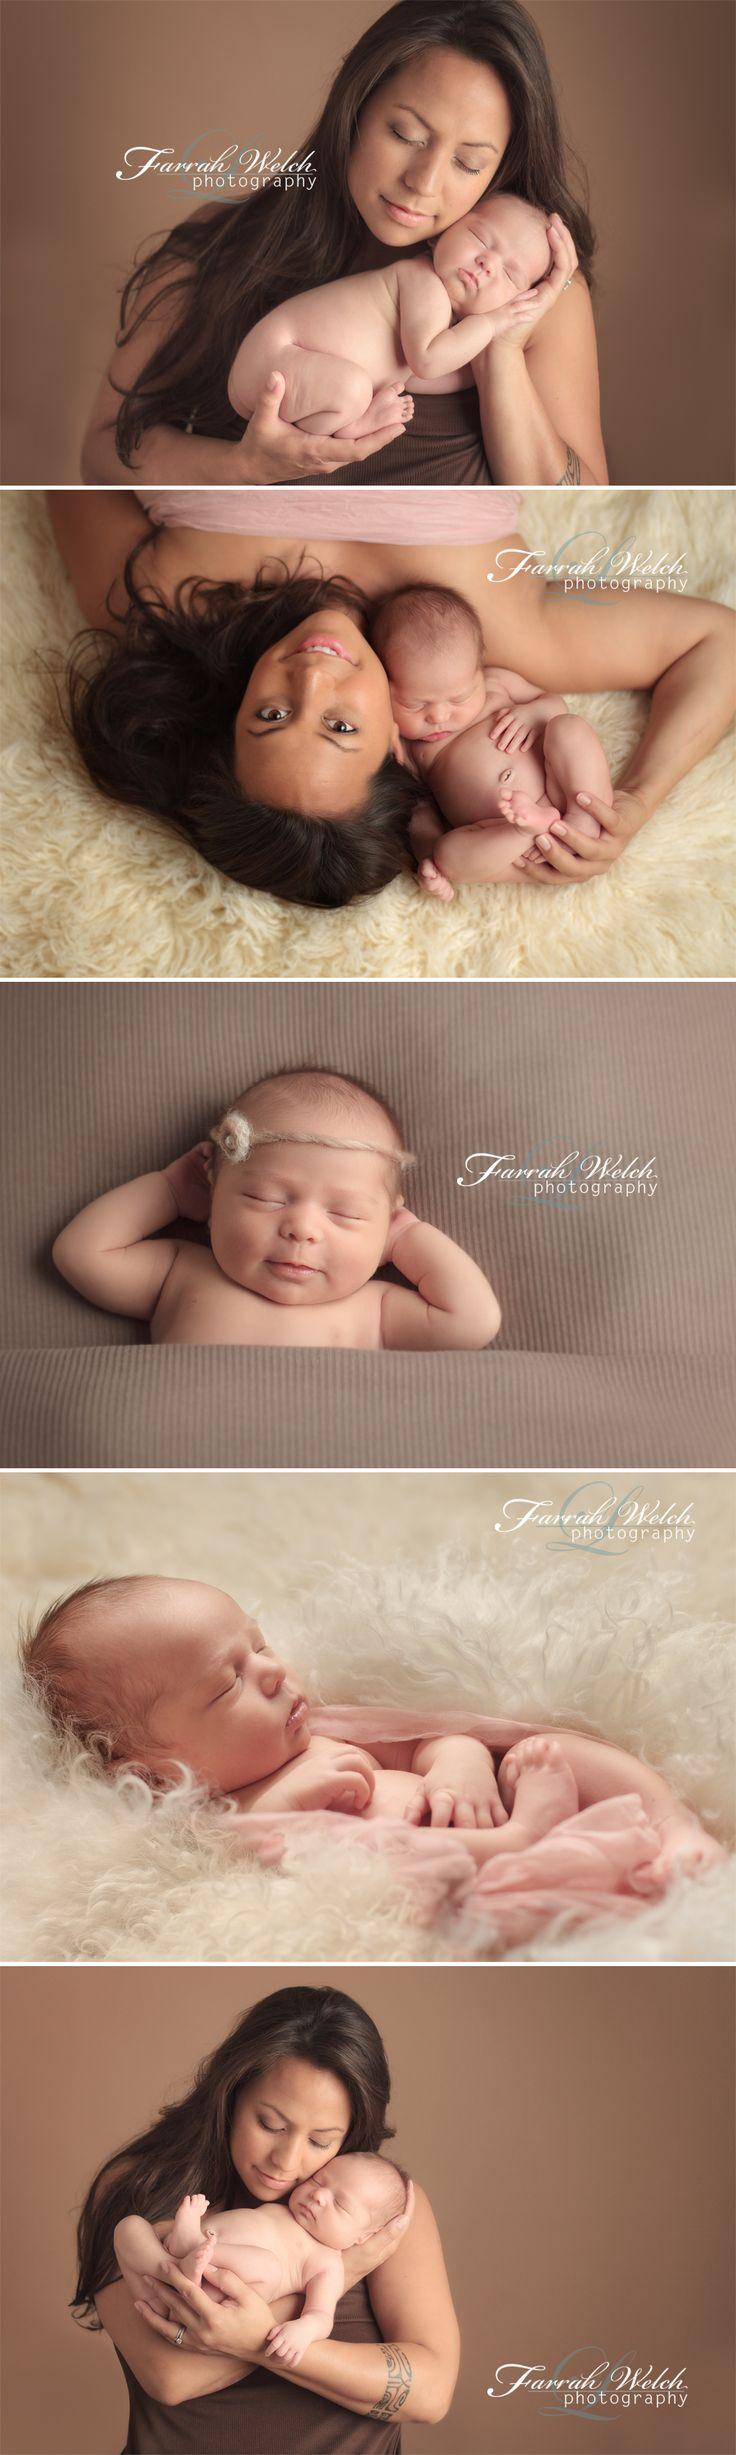 Photos by Farrah Welch Photography, Santa Clarita Newborn Photographer. www.farrahwelchphotography.com